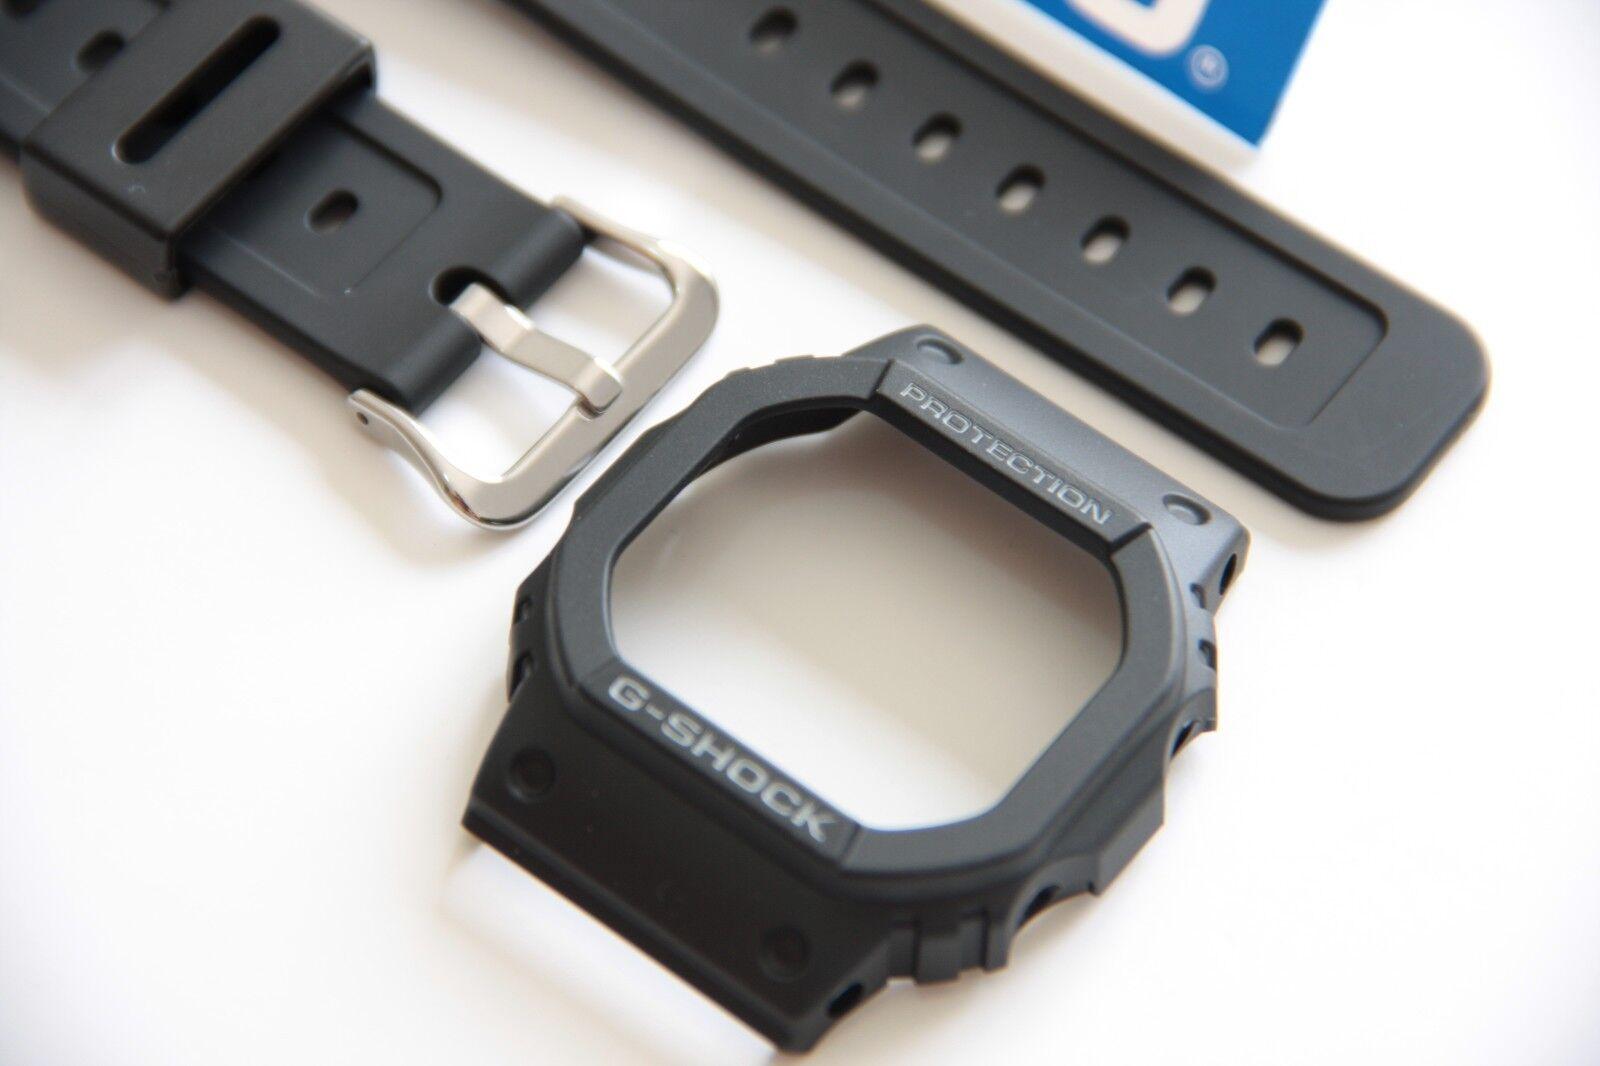 Casio G Shock Dw 5600e Black Watch Band Bezel Watch Band Case Cover Dw 5600 Ebay